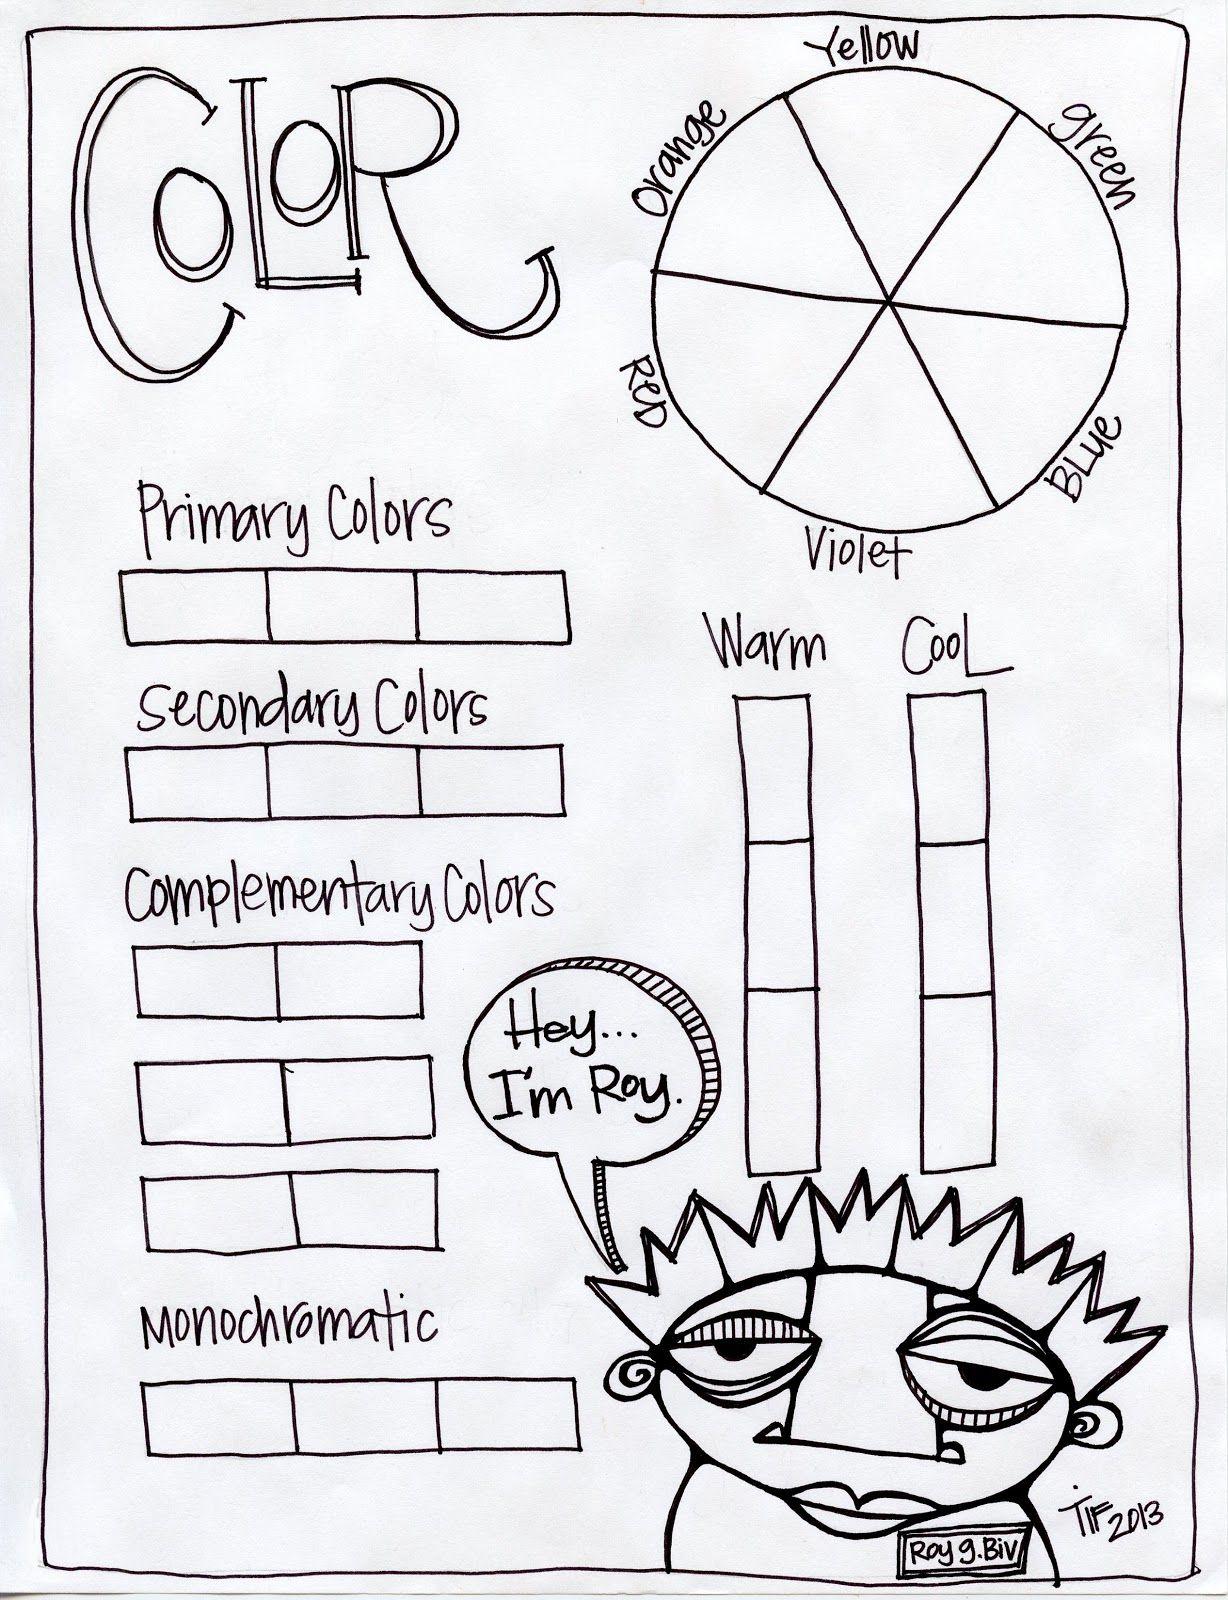 hight resolution of Pin by Jennifer Barciszewski on Elementary Art: Critique and Assessment    Art lessons elementary